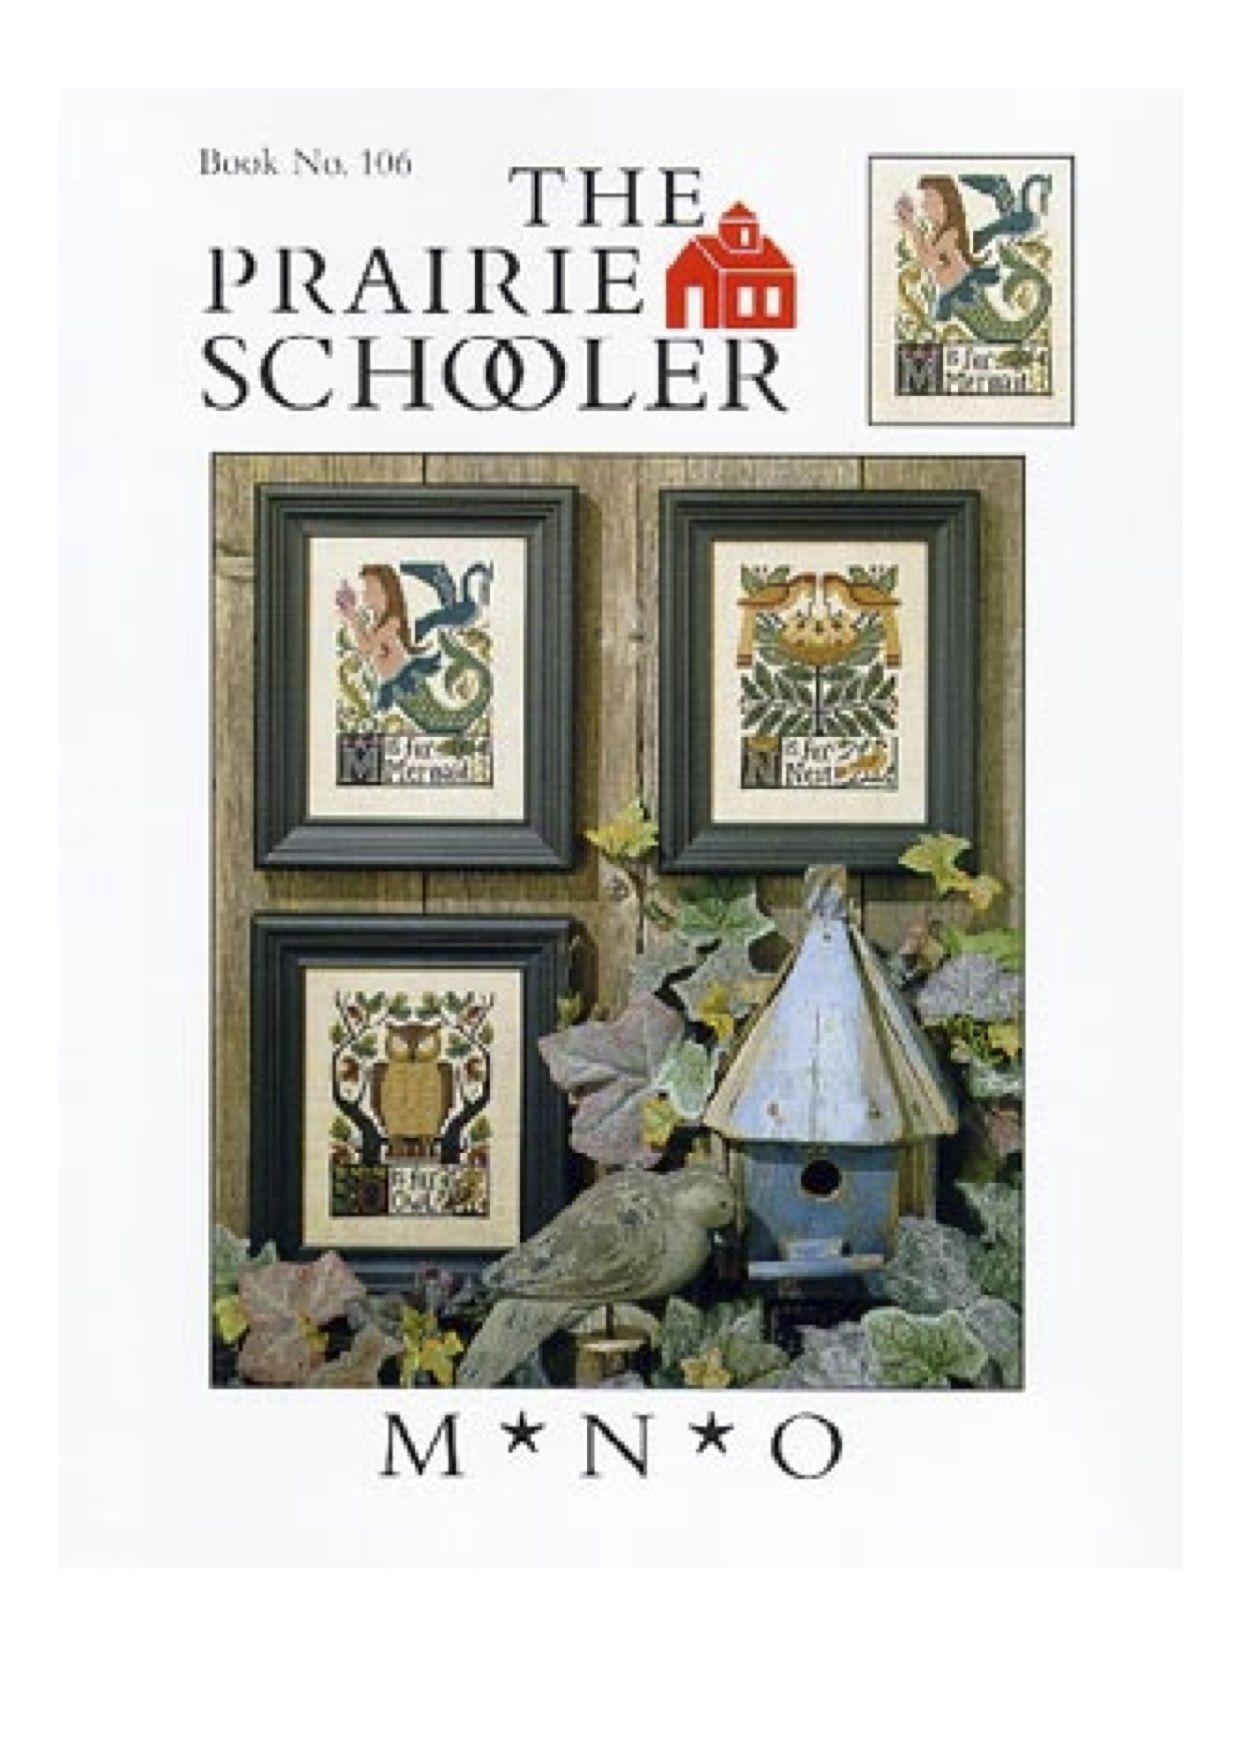 THE PRARIE SCHOOLER ALPHABET LETTERS M & N & O 1/5